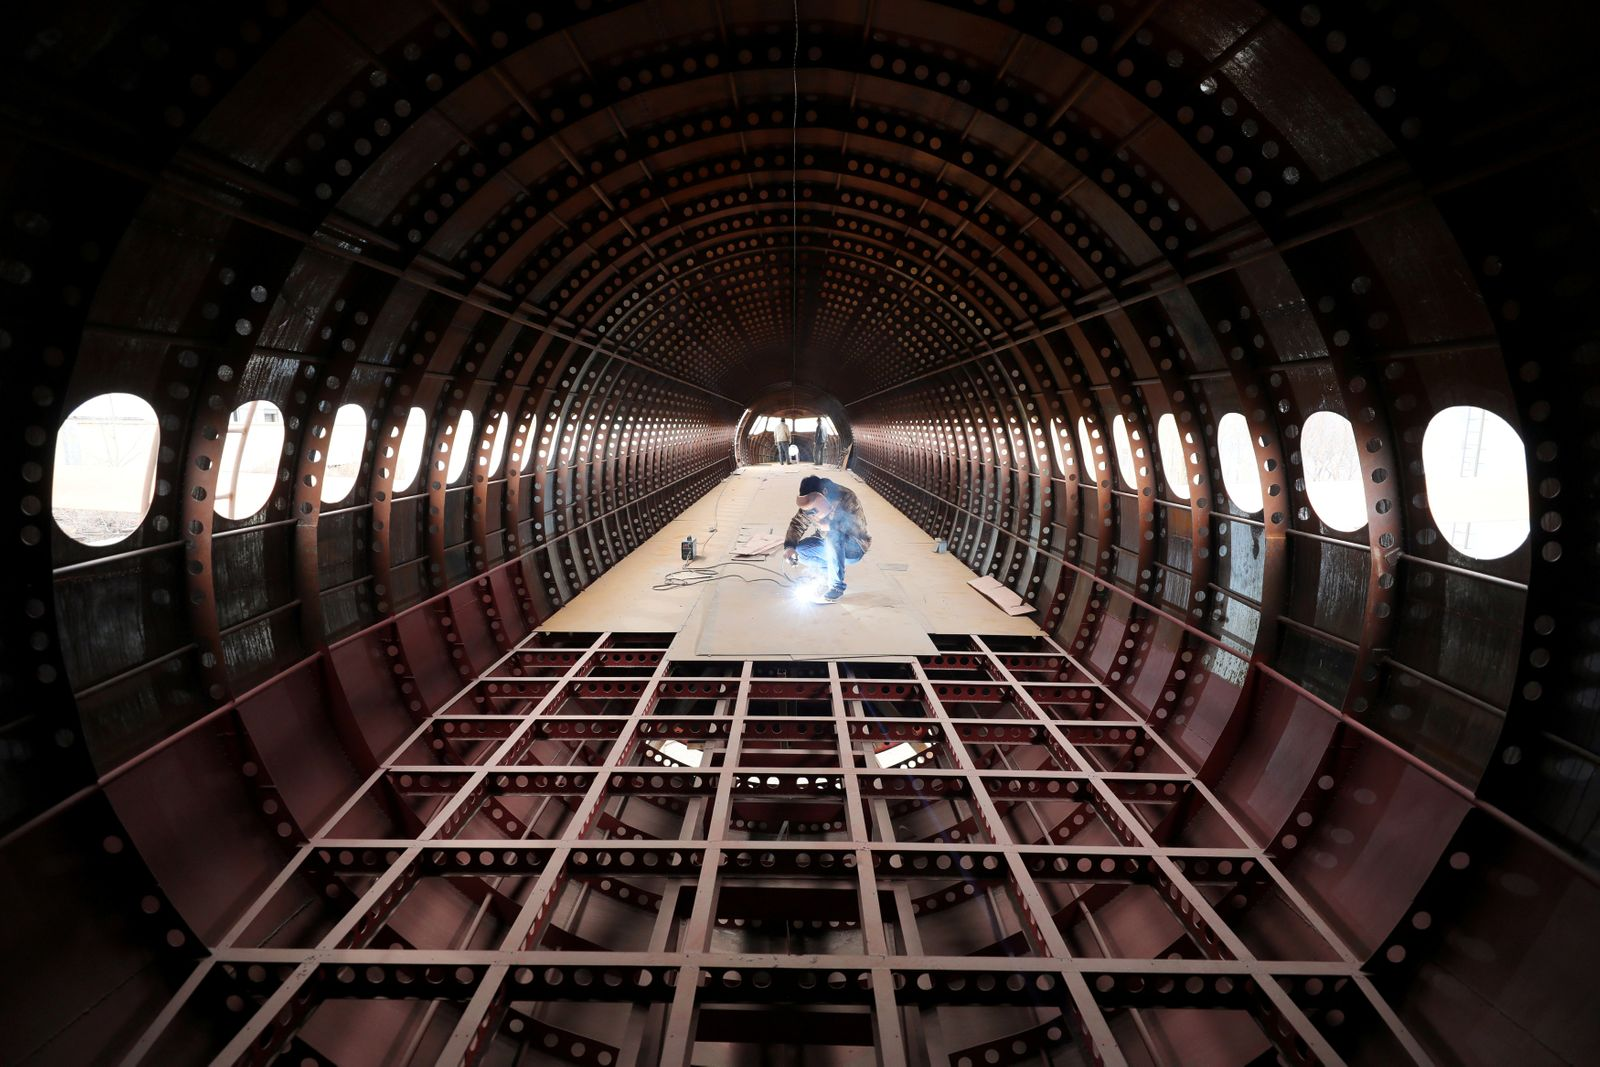 Zhu Yue welds inside a full-scale replica of Airbus A320 plane, in Kaiyuan